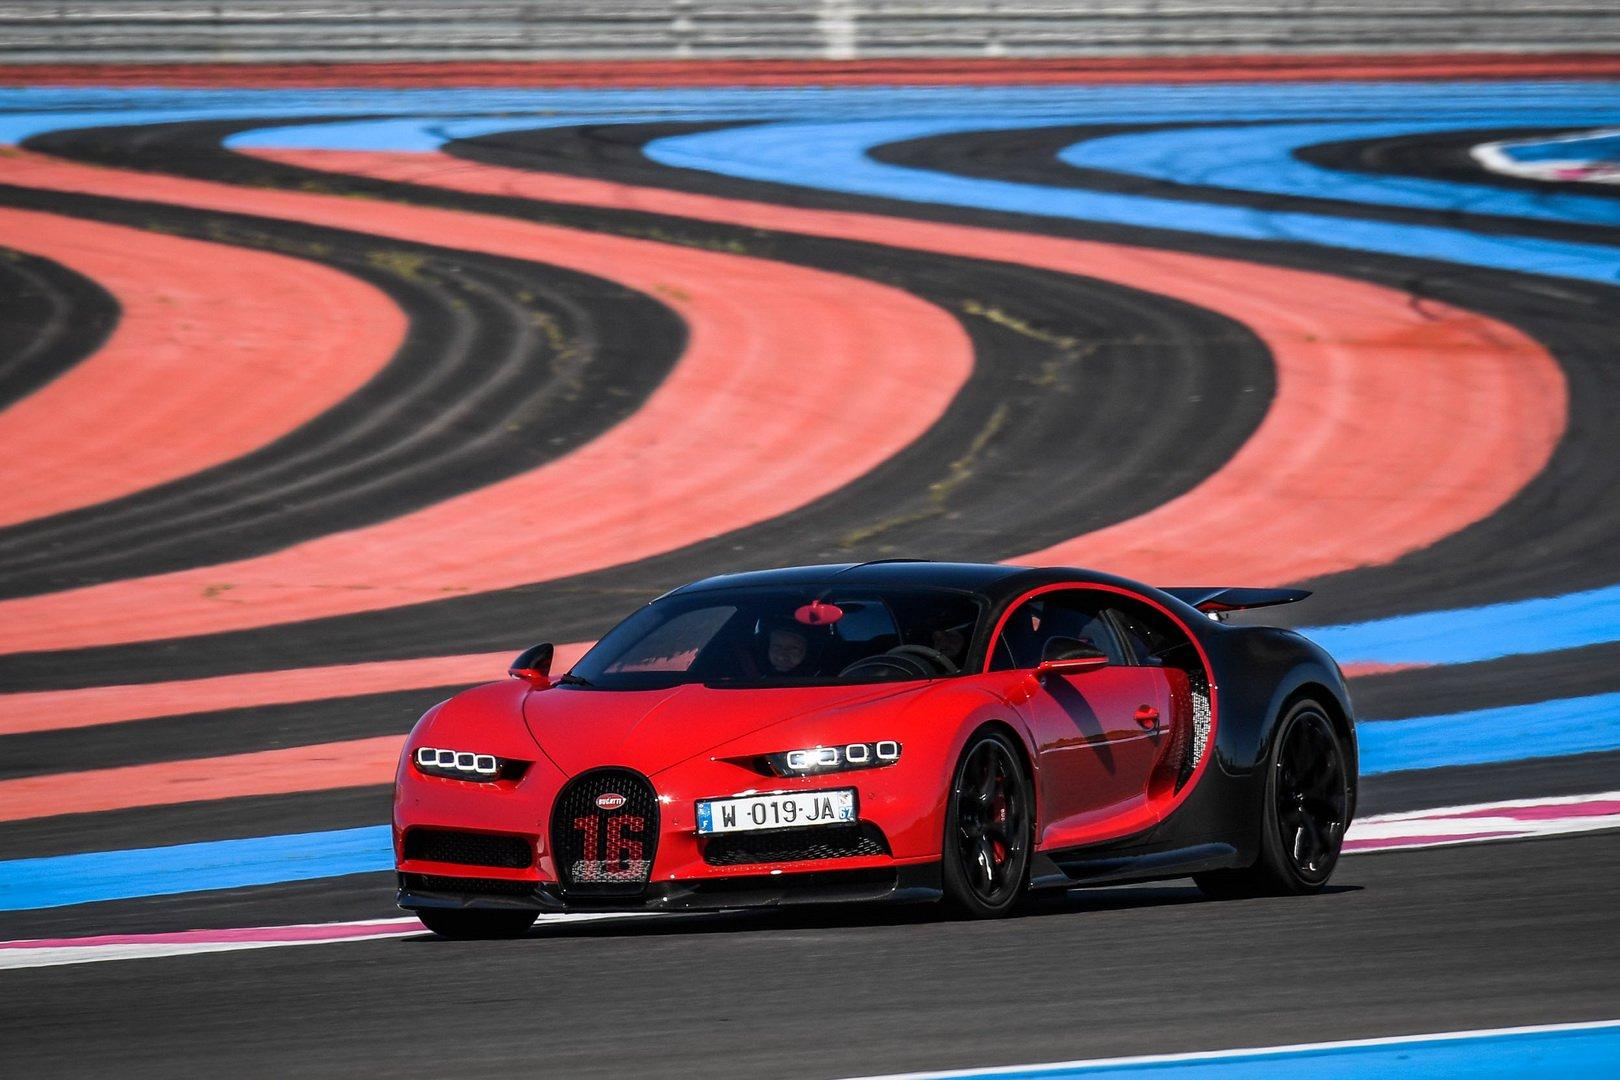 Bugatti-Chiron-and-Chiron-Sport-at-Paul-Ricard-Circuit-7